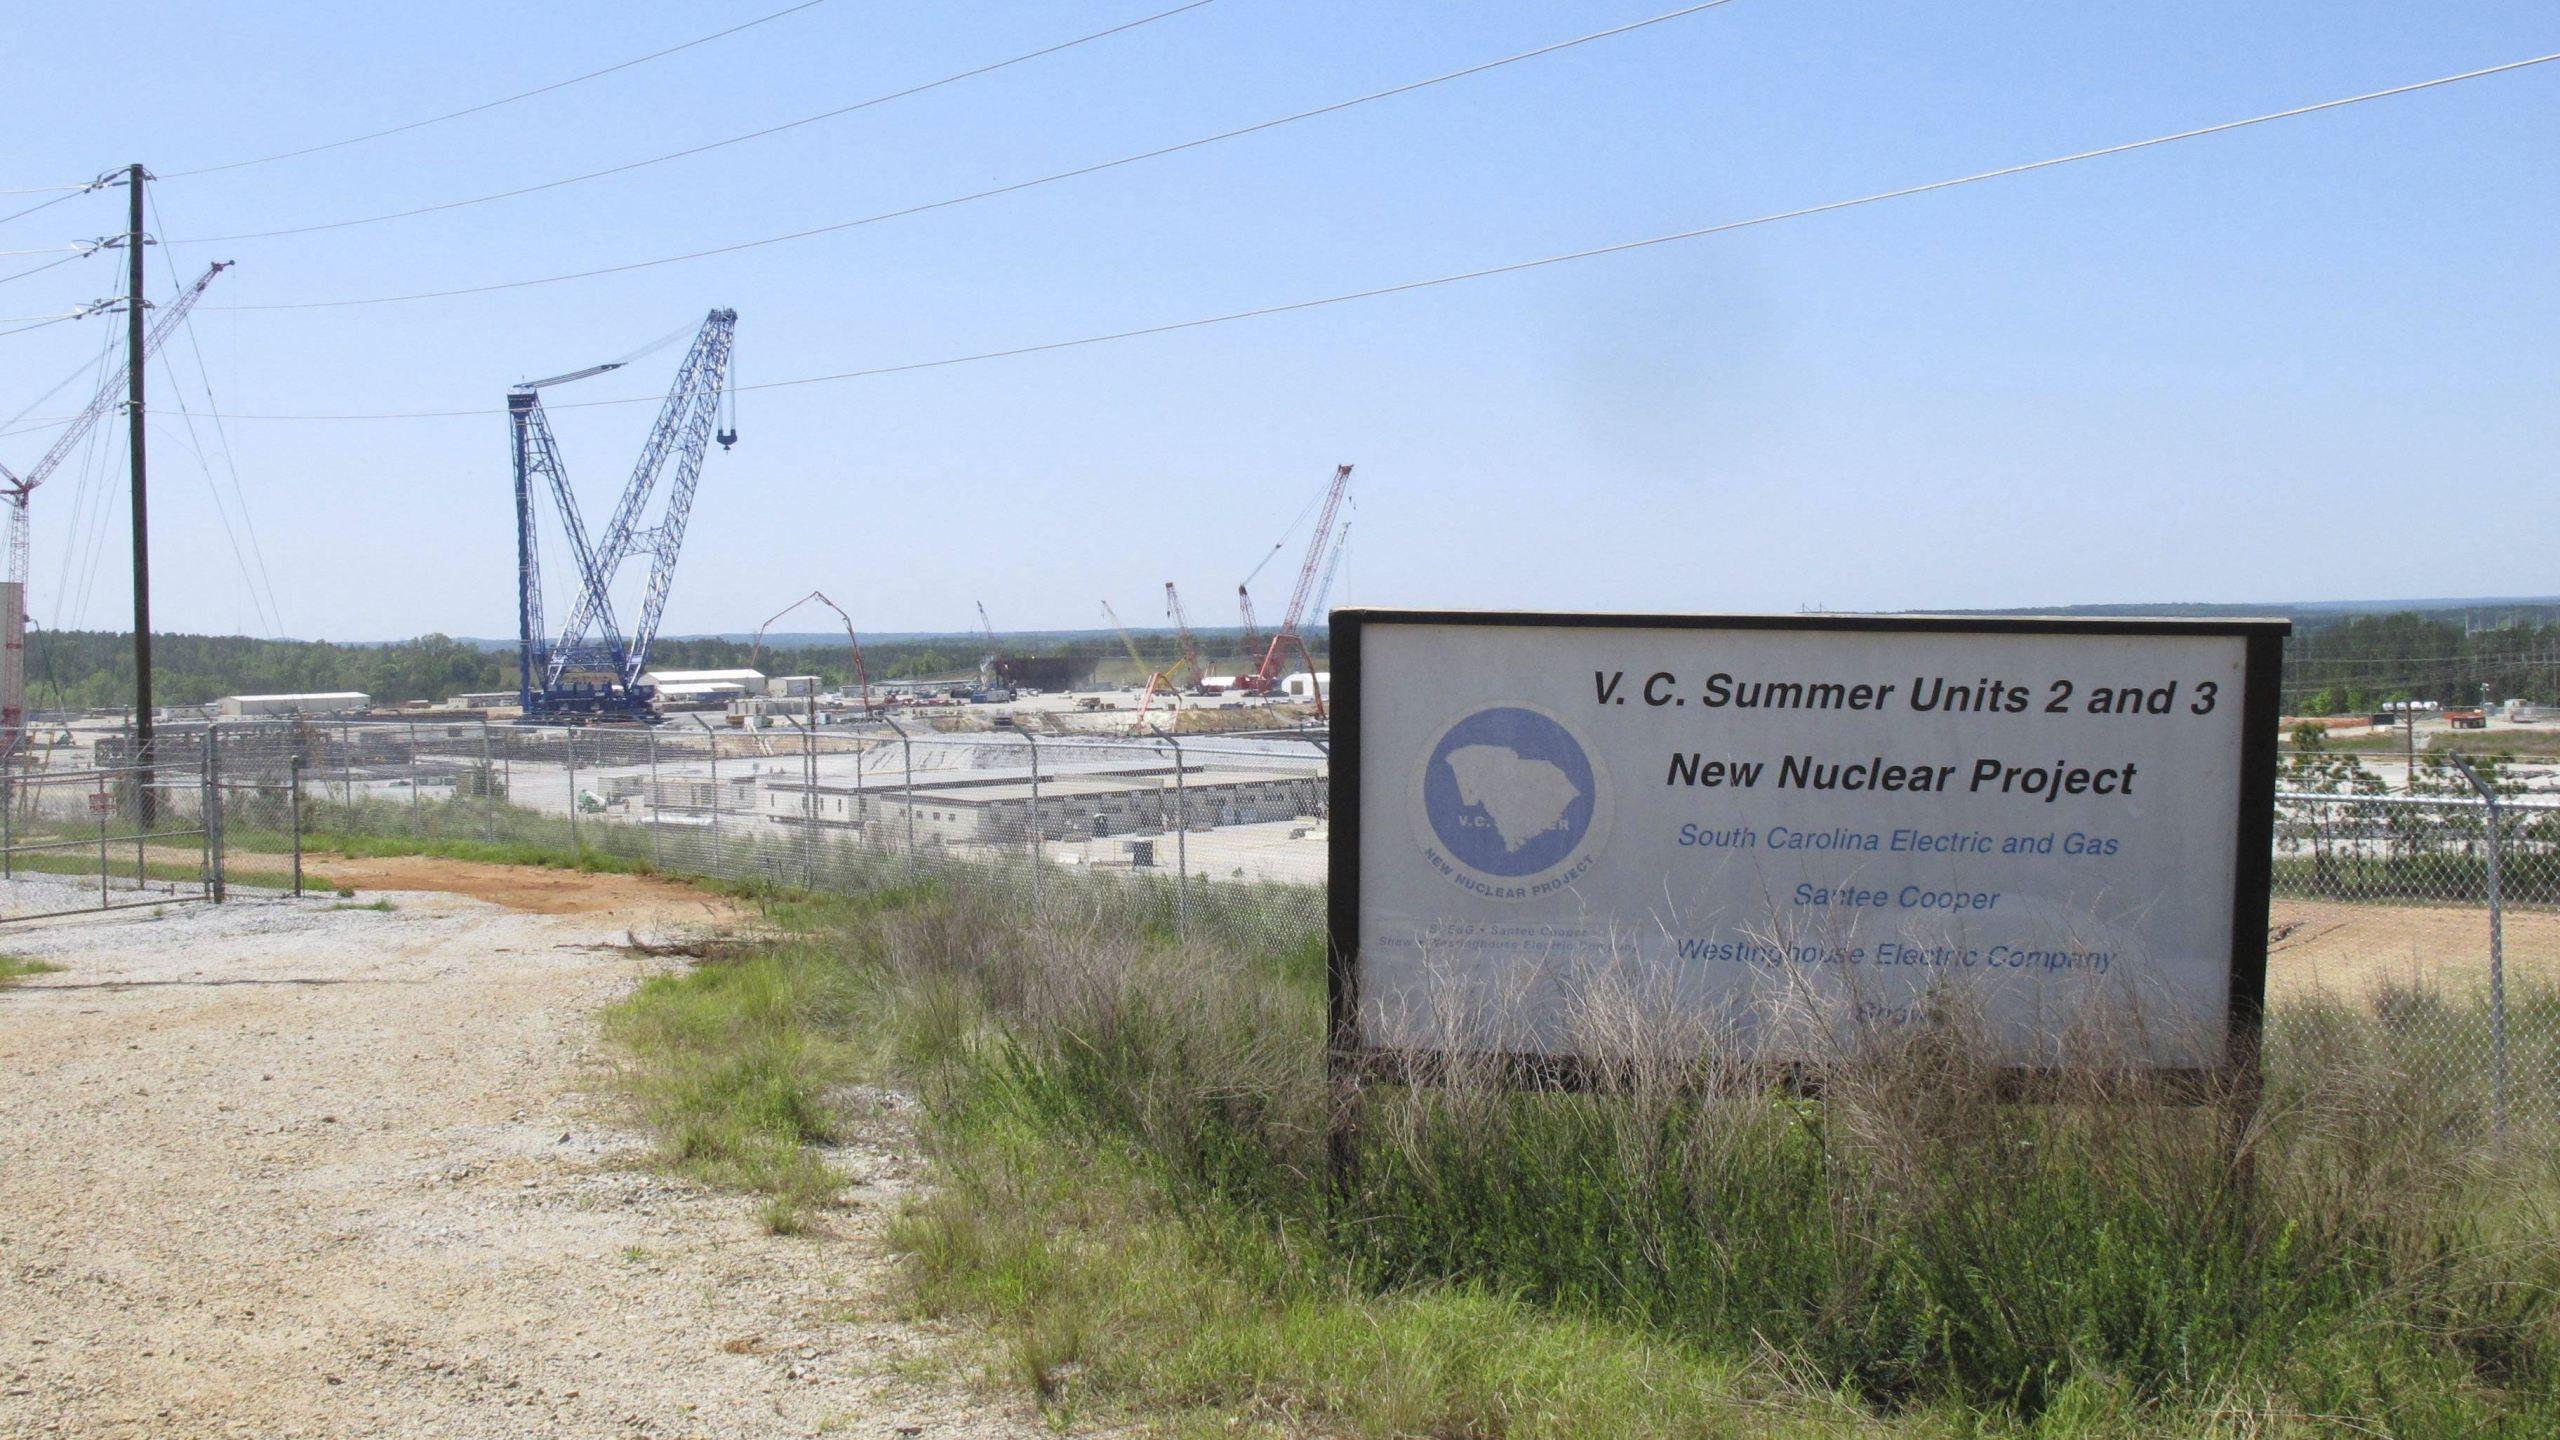 Nuclear-Reactors-South-Carolina_279020